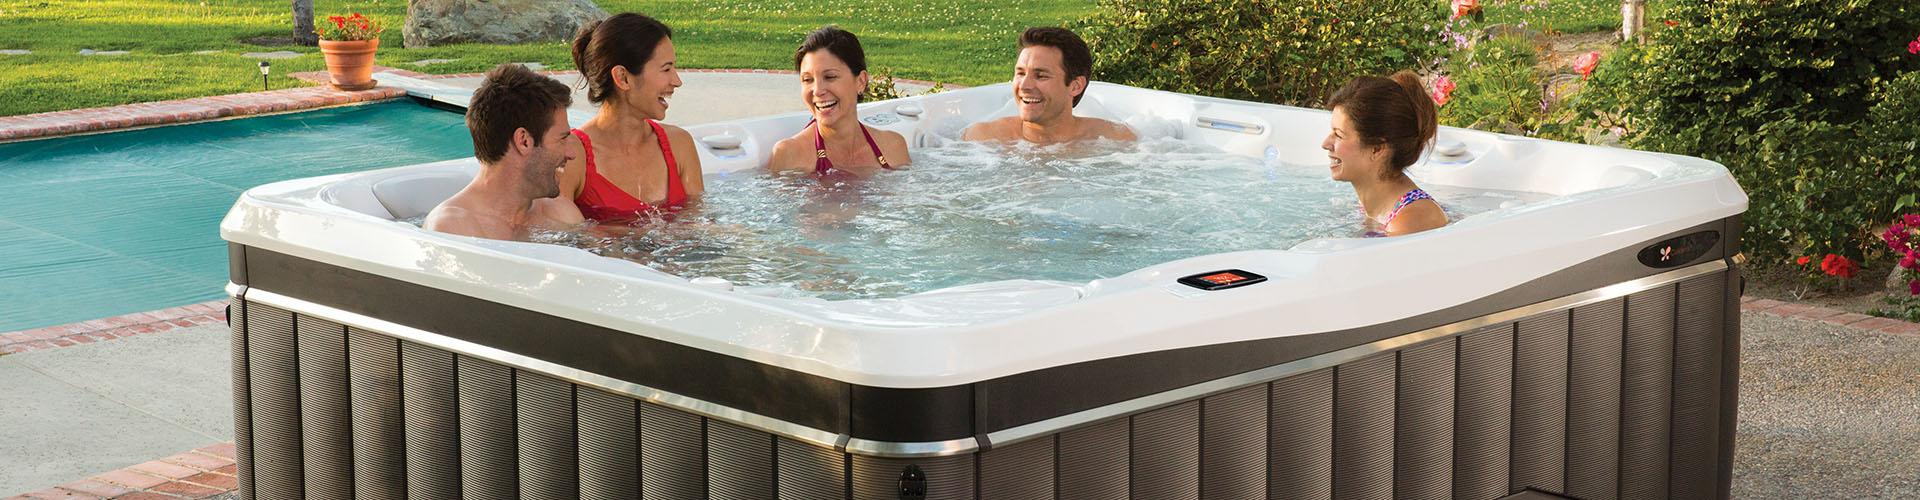 Luxury Vs. Entry Level Hot Tubs